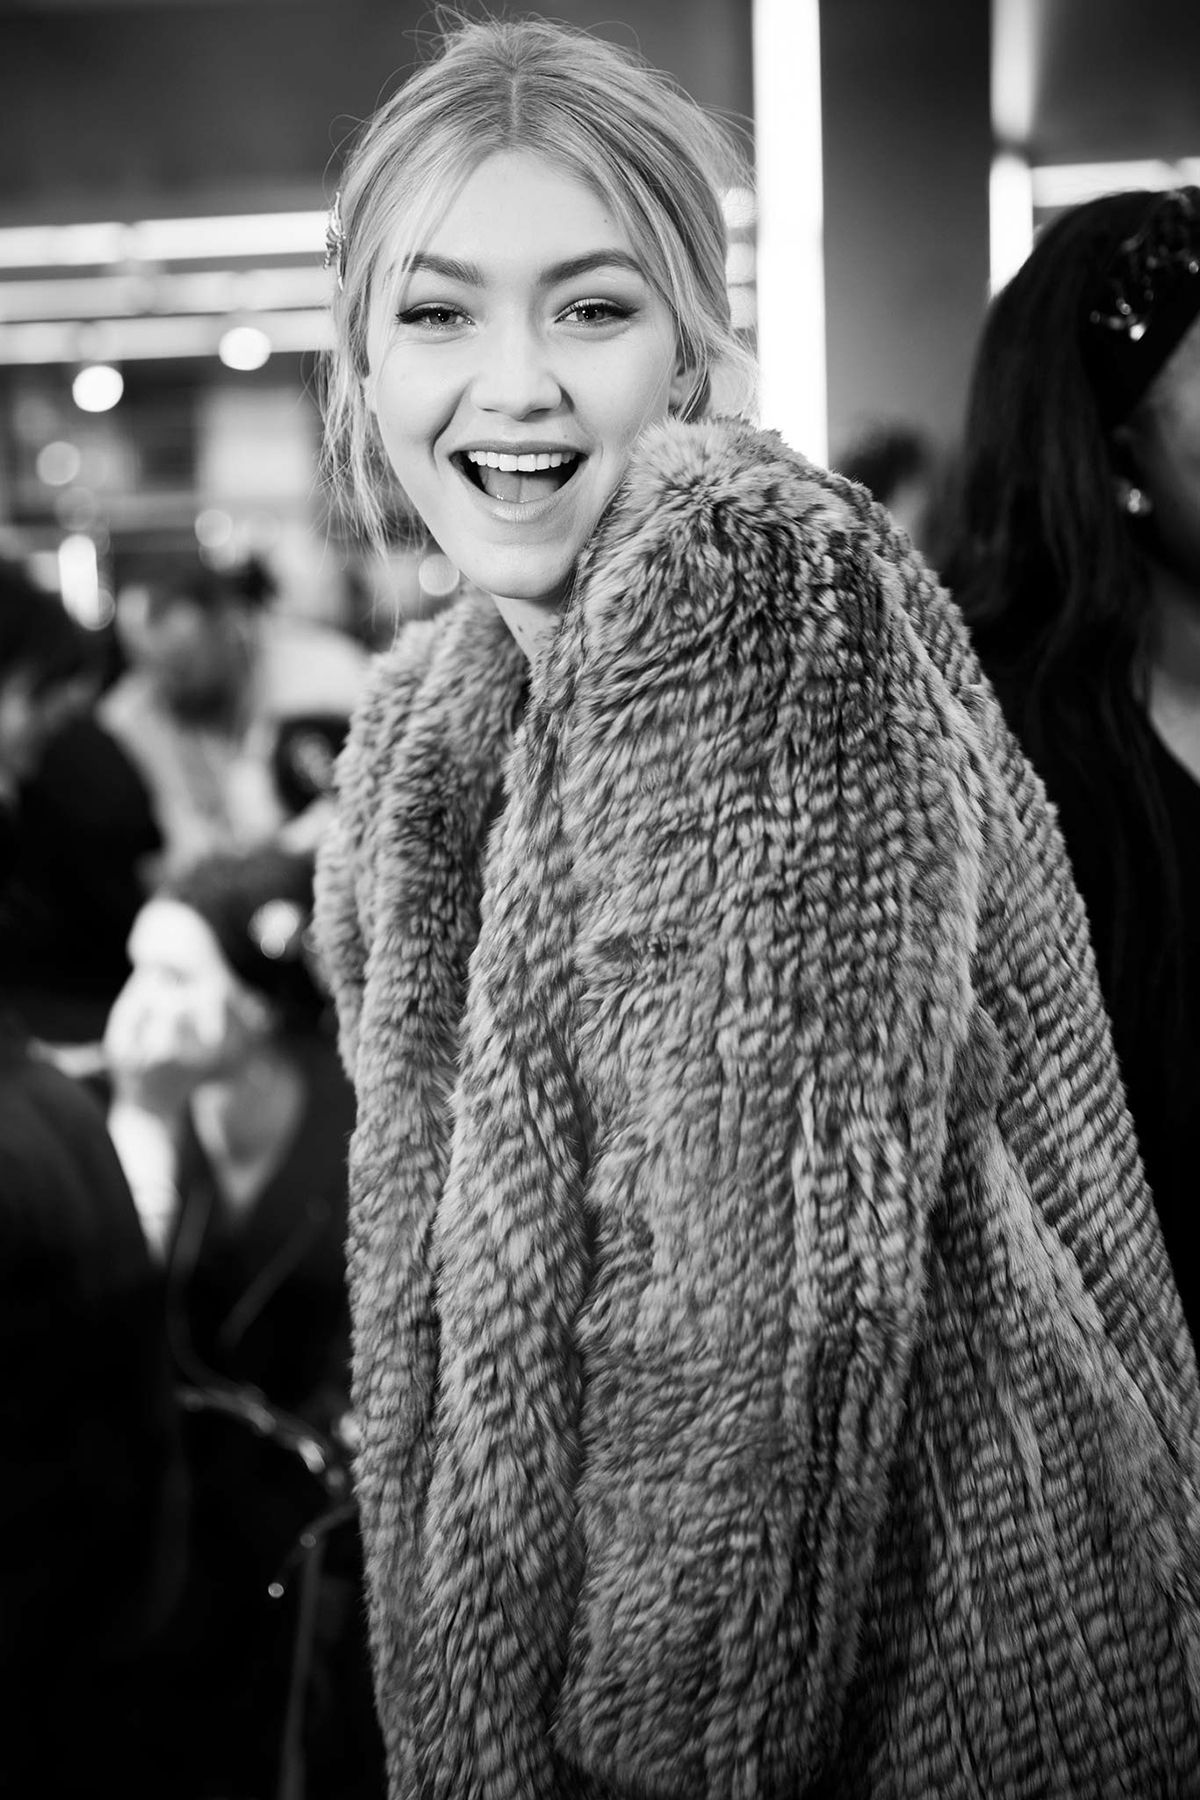 Gigi Hadid - Backstage at Dolce & Gabbana, Fall 2015 RTW